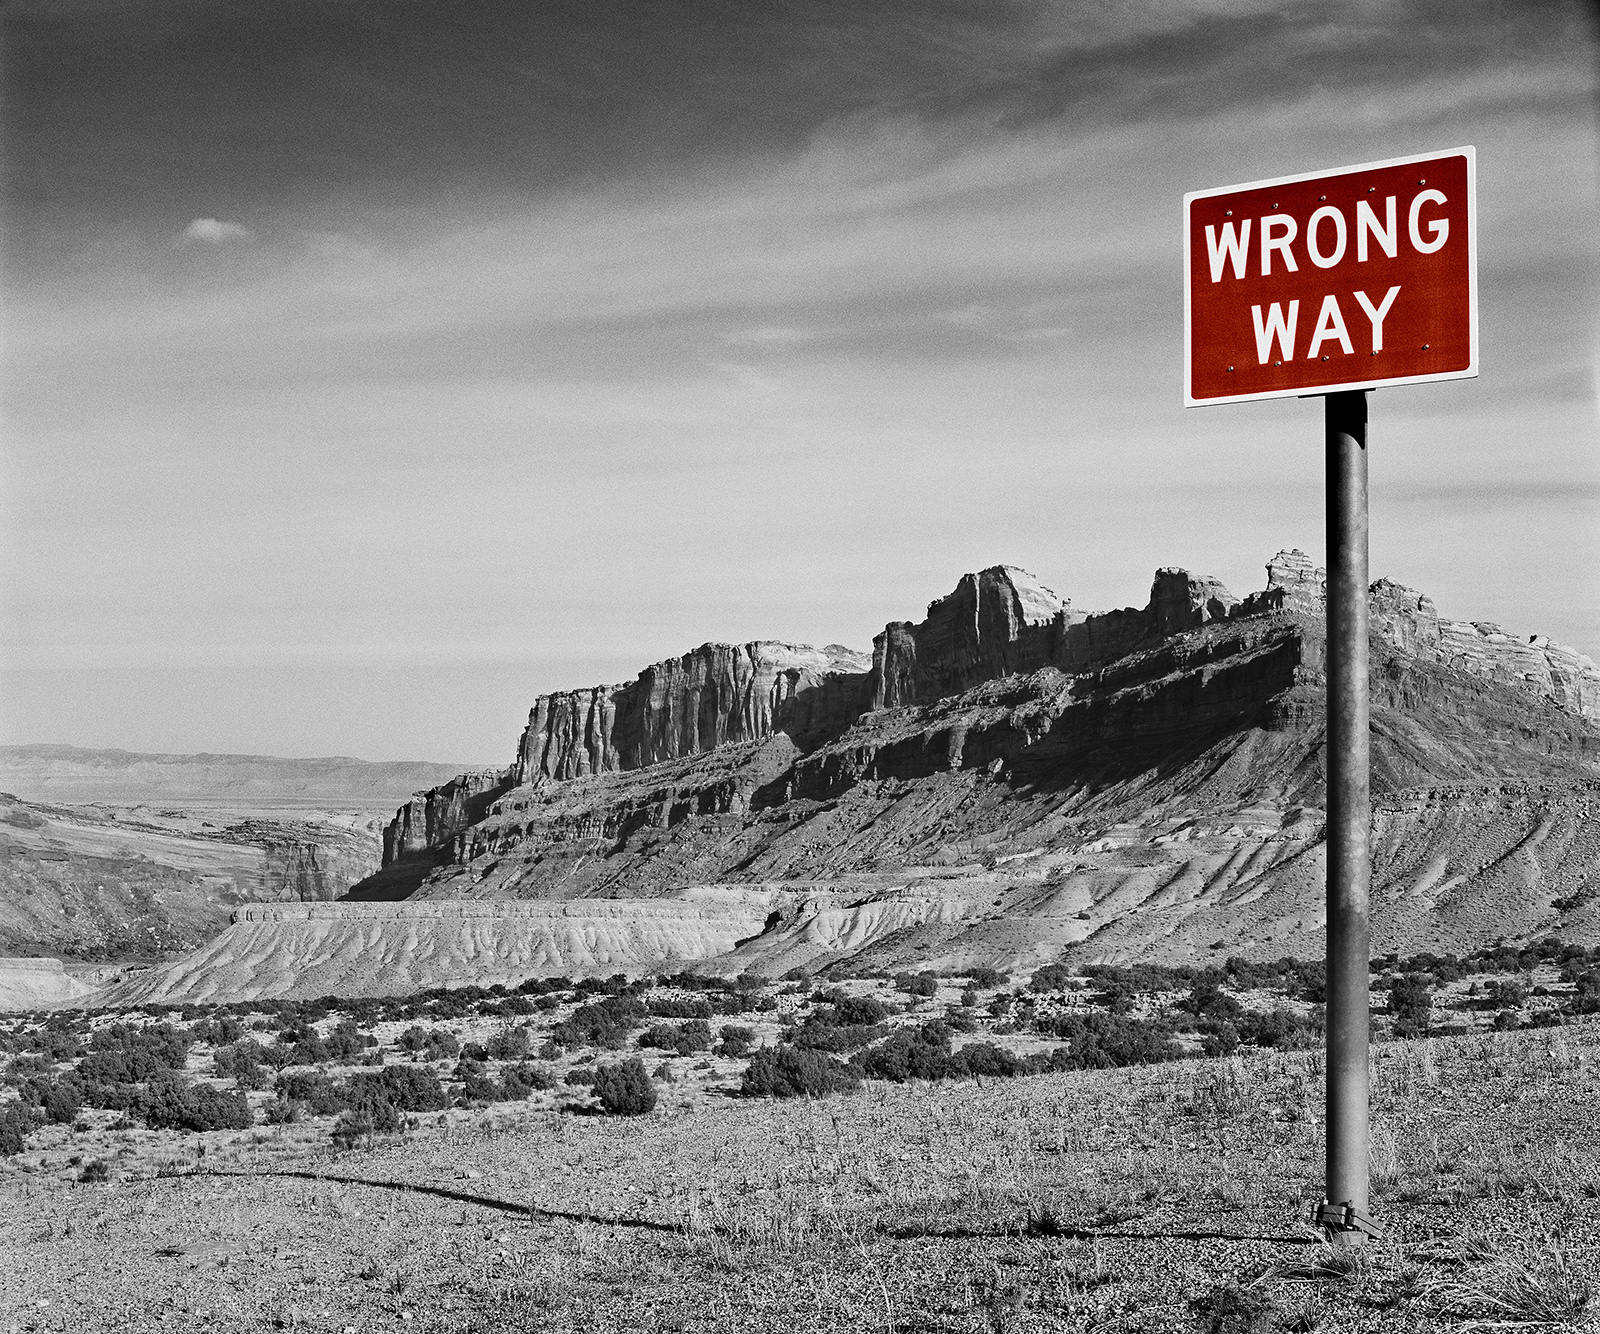 Wrong Way, UT